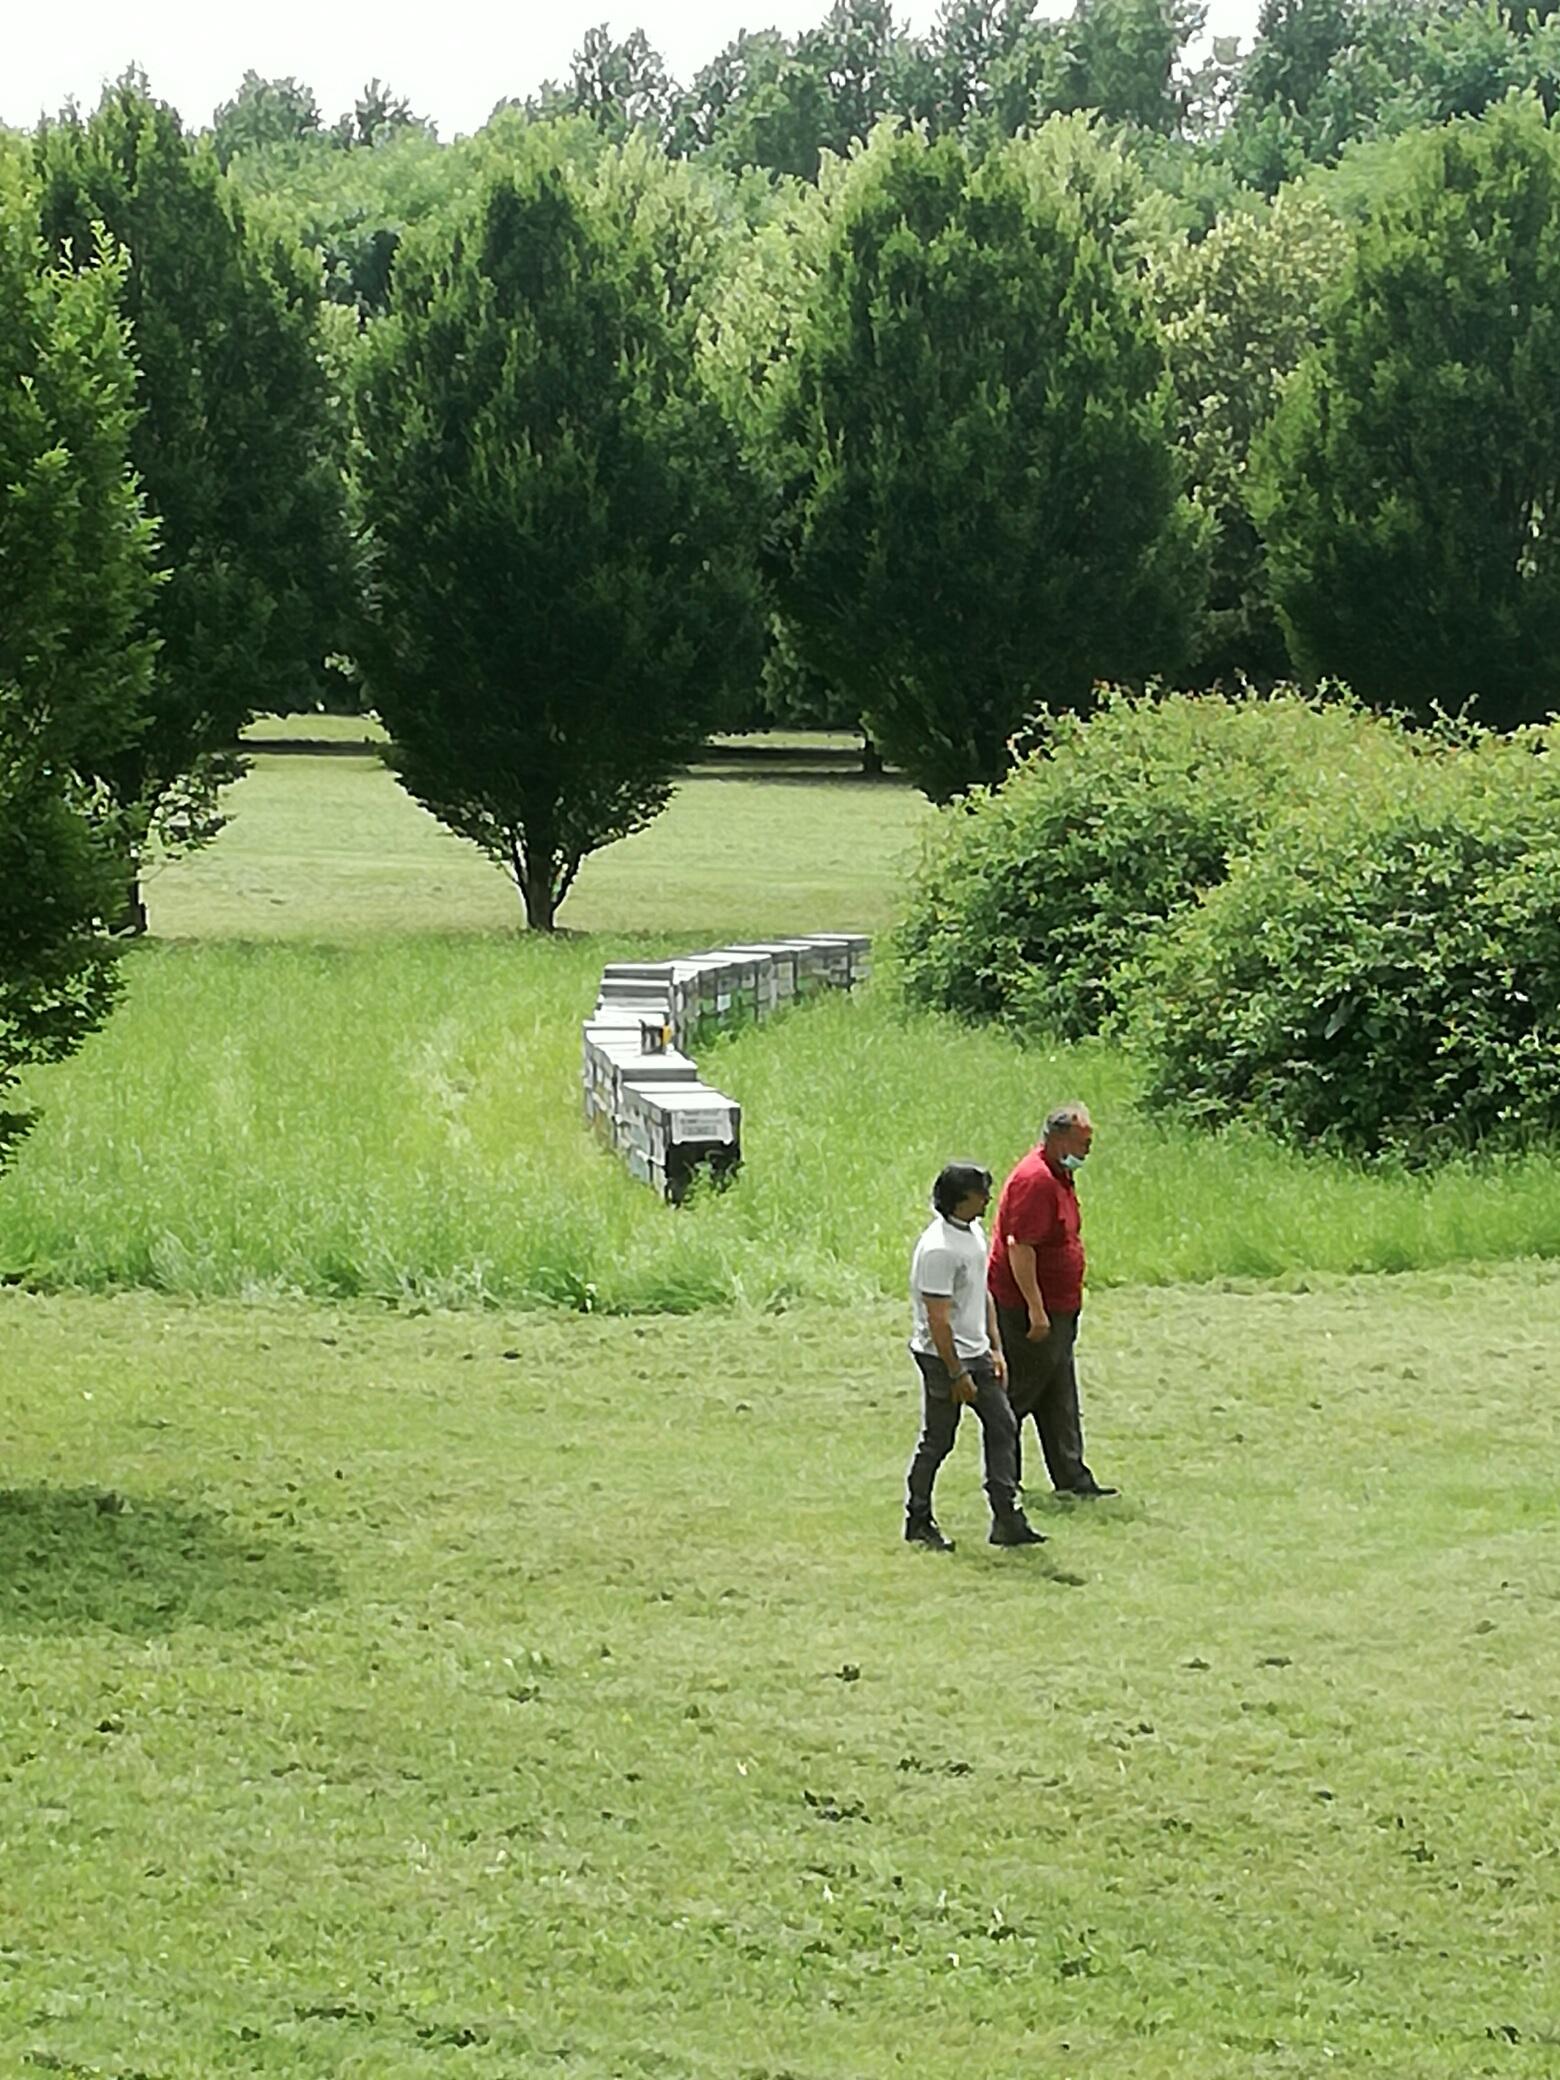 arnie apicoltura nei parchi